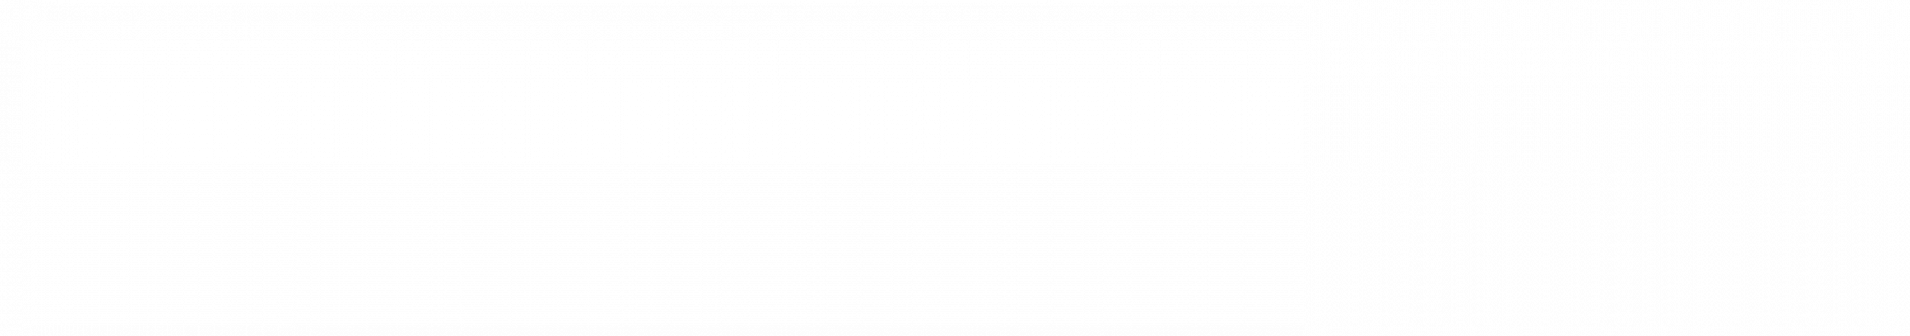 logos-epf-dta-3-resplandor